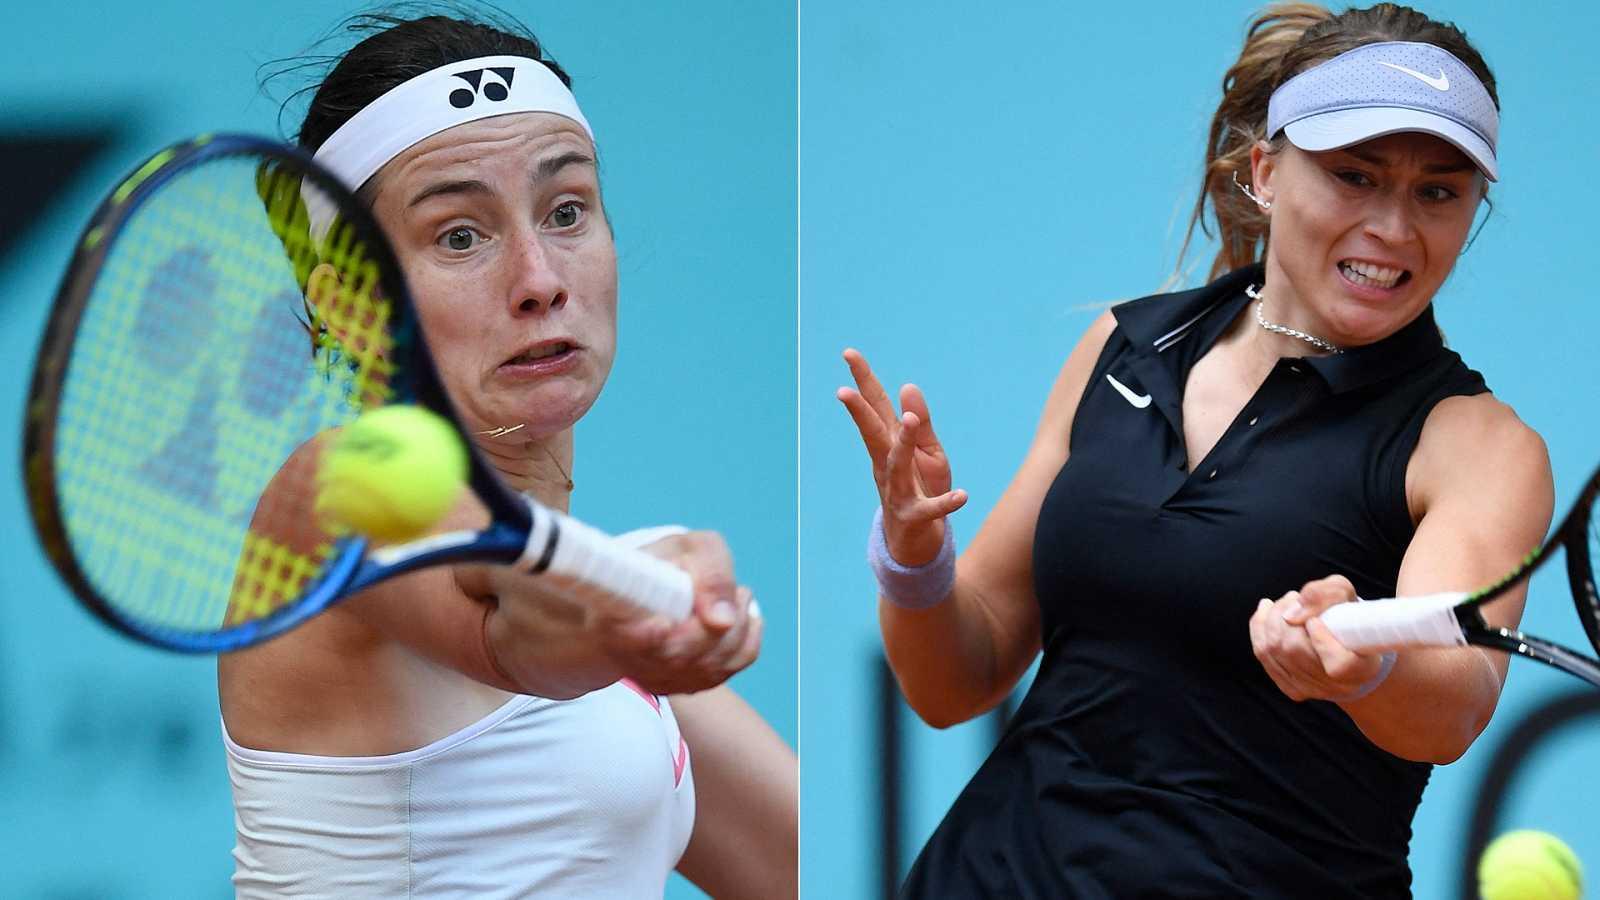 Tenis - WTA Mutua Madrid Open: P. Badosa - A. Sevastova - ver ahora